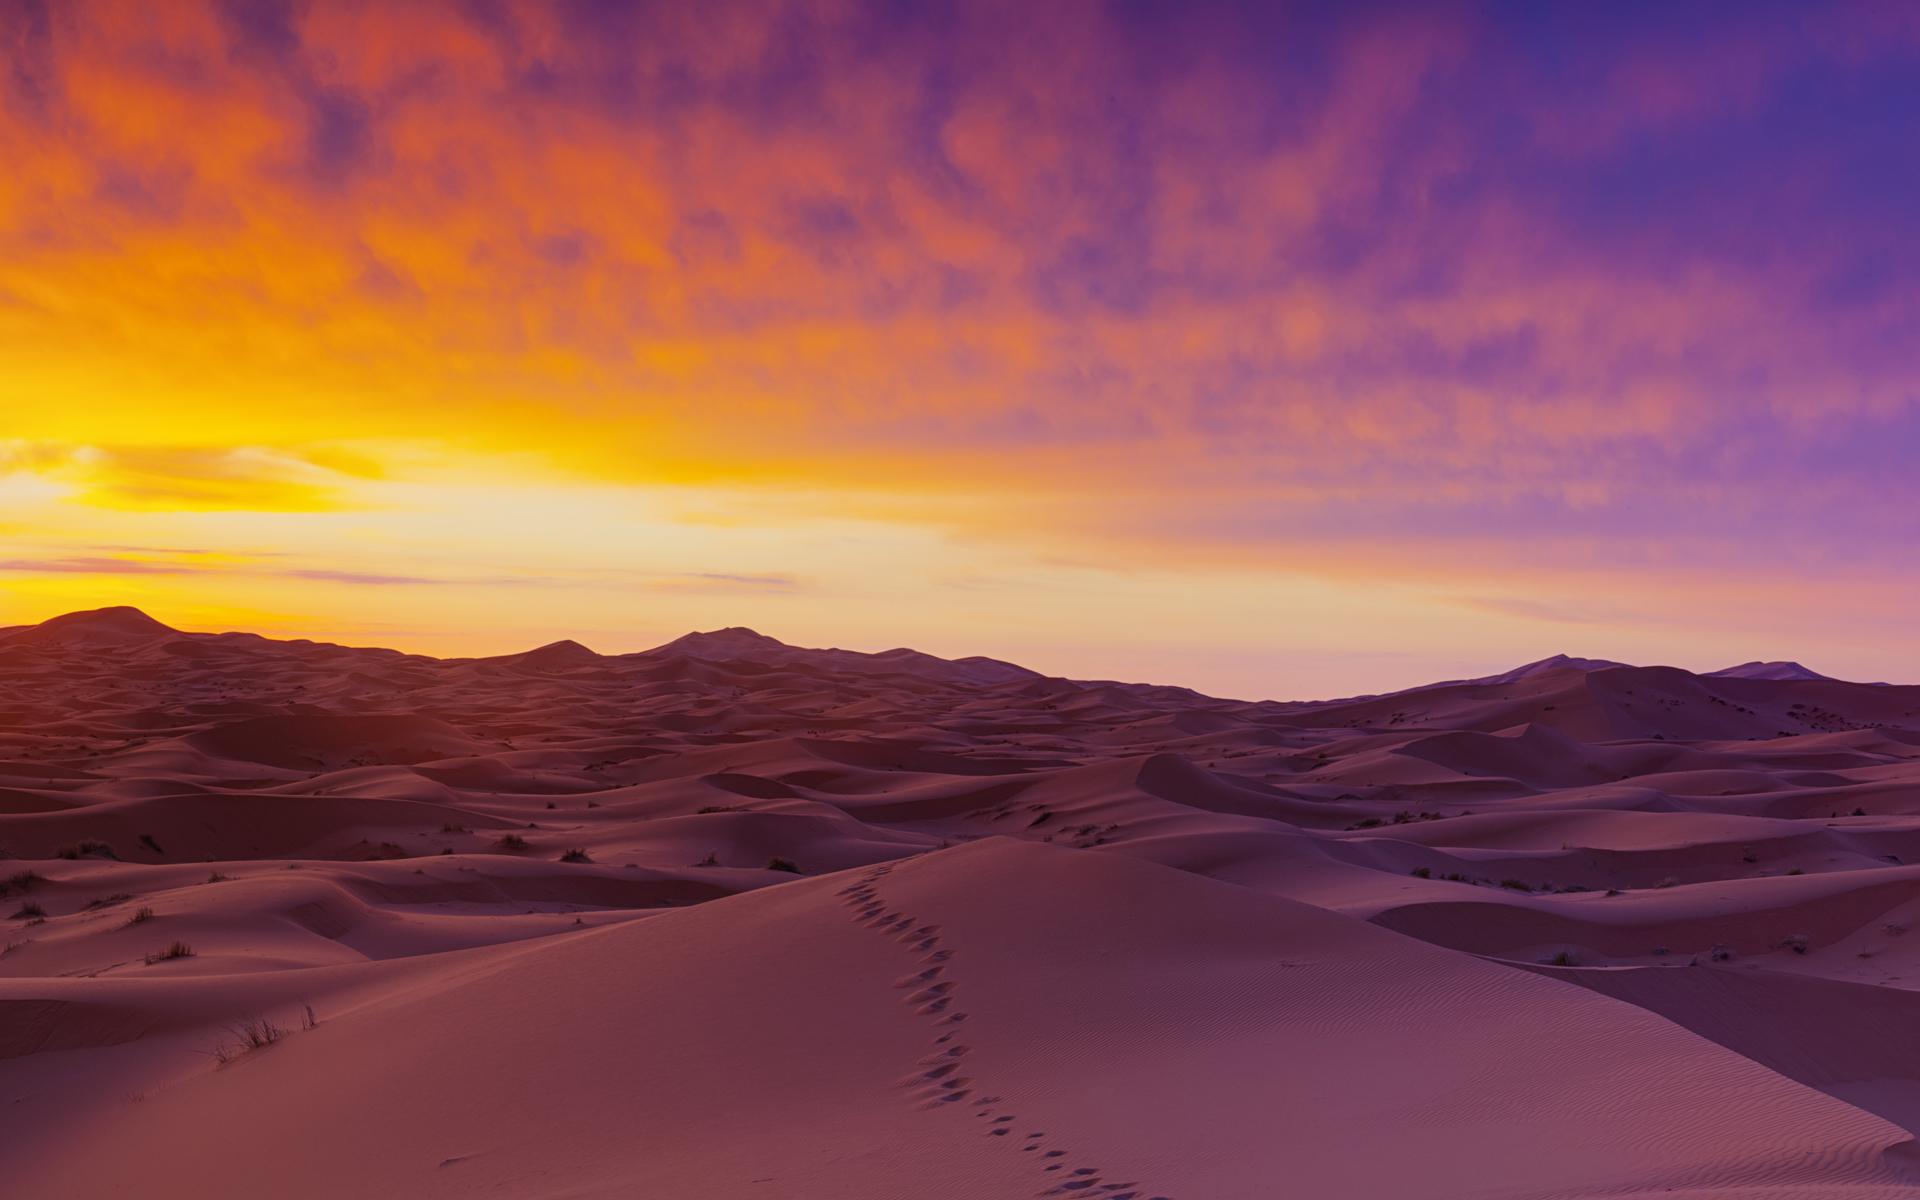 46+ Desert Wallpaper HD on WallpaperSafari